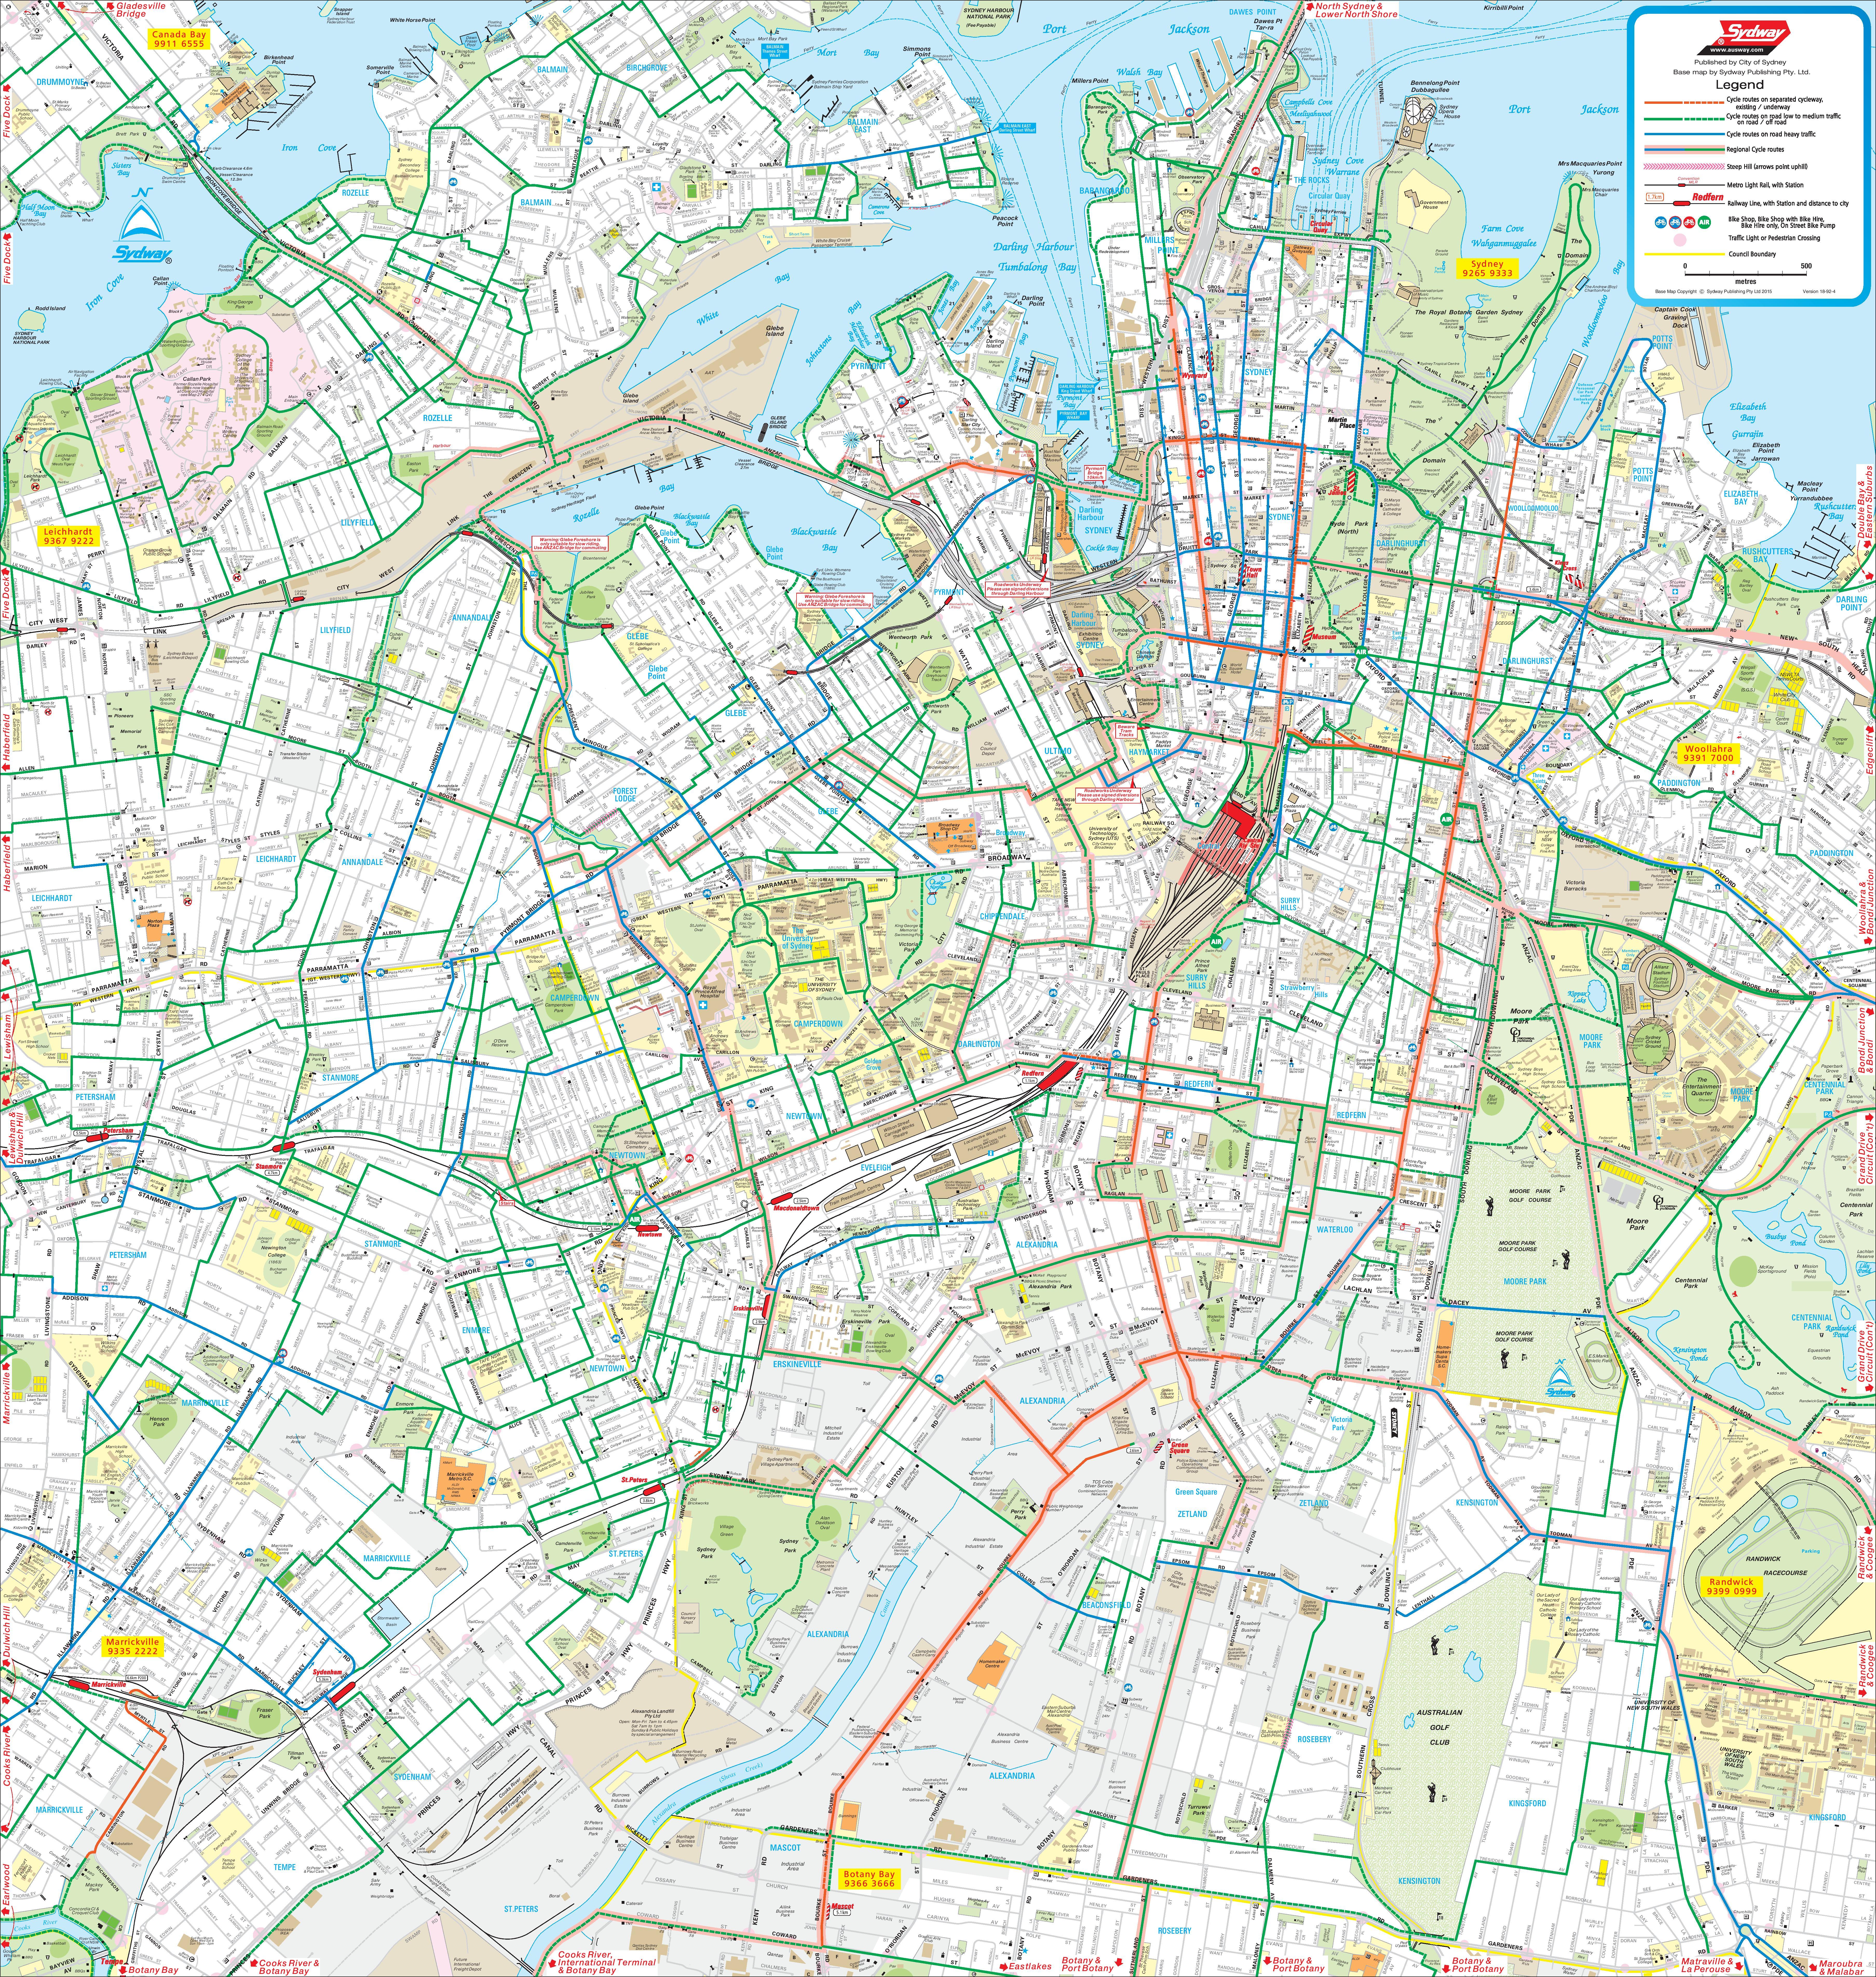 Where Is Sydney Australia On A Map.Sydney Maps Australia Maps Of Sydney